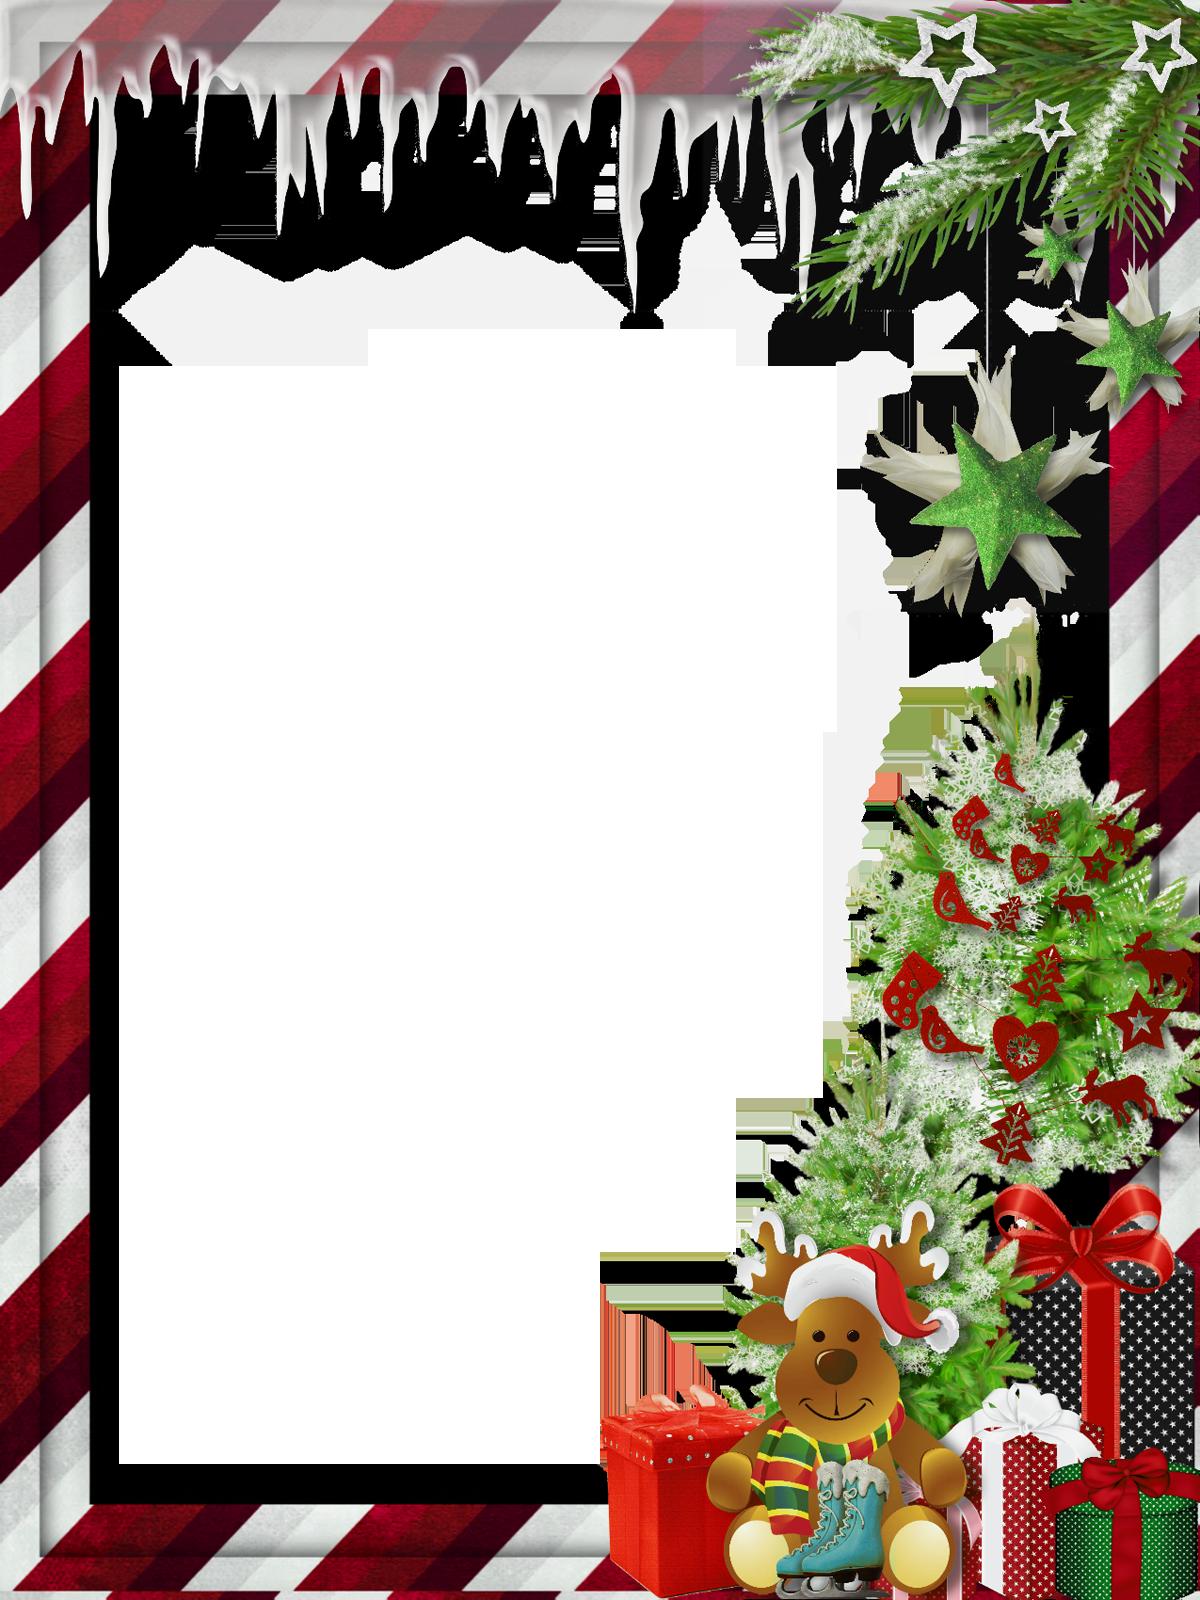 Clipart reindeer holiday. Transparent christmas photo frame